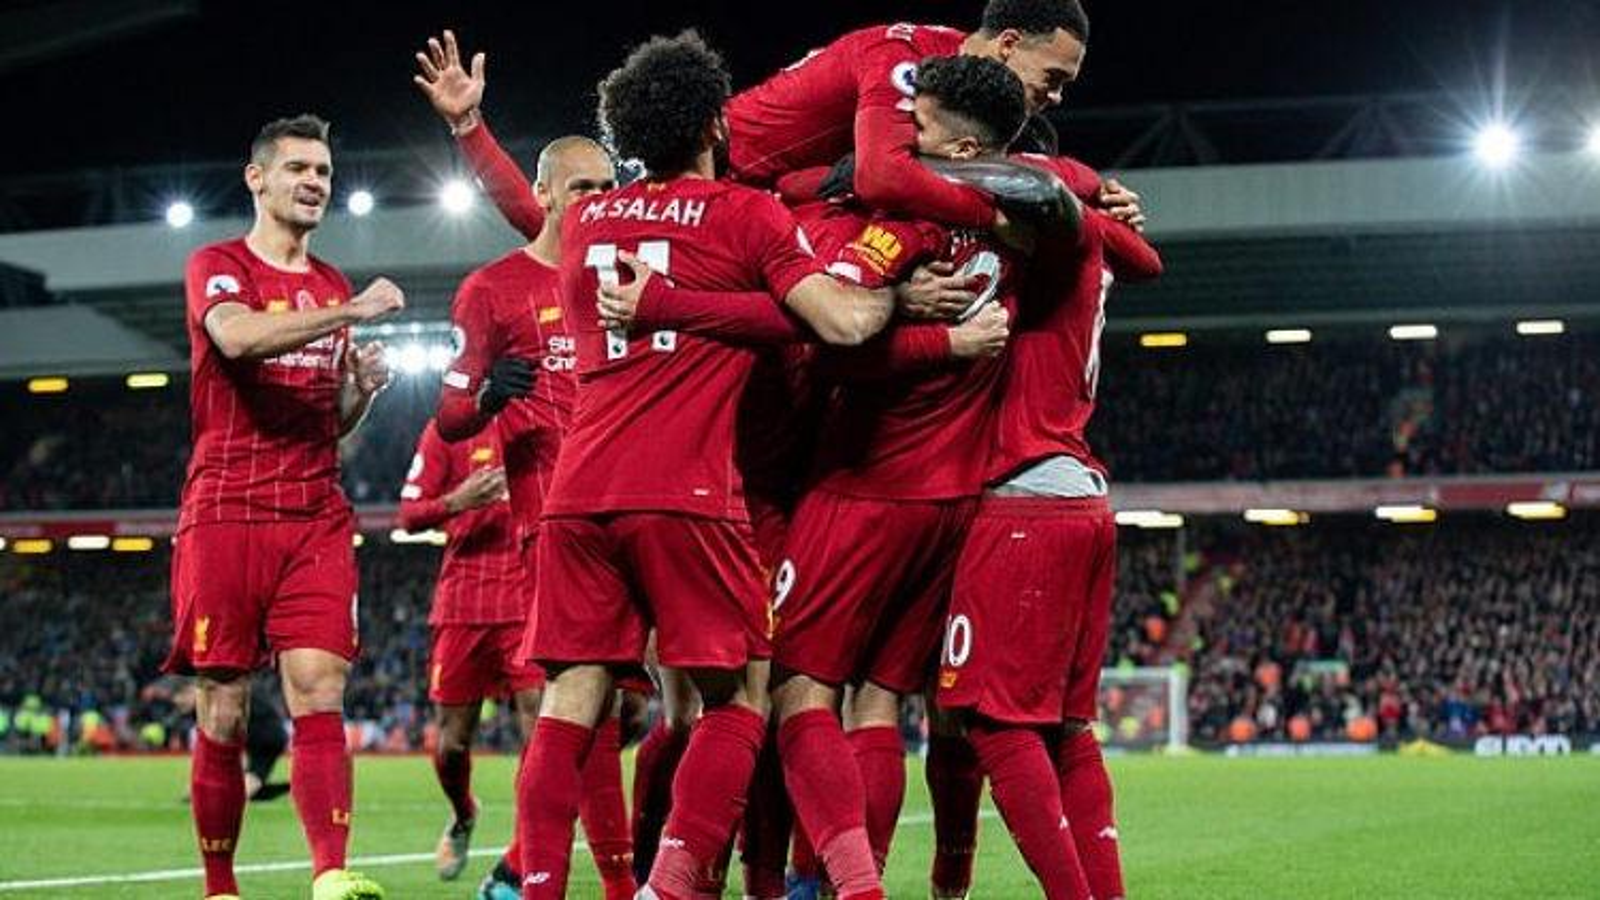 Premier League thất thu số tiền cực lớn ở mùa giải 2019/2020